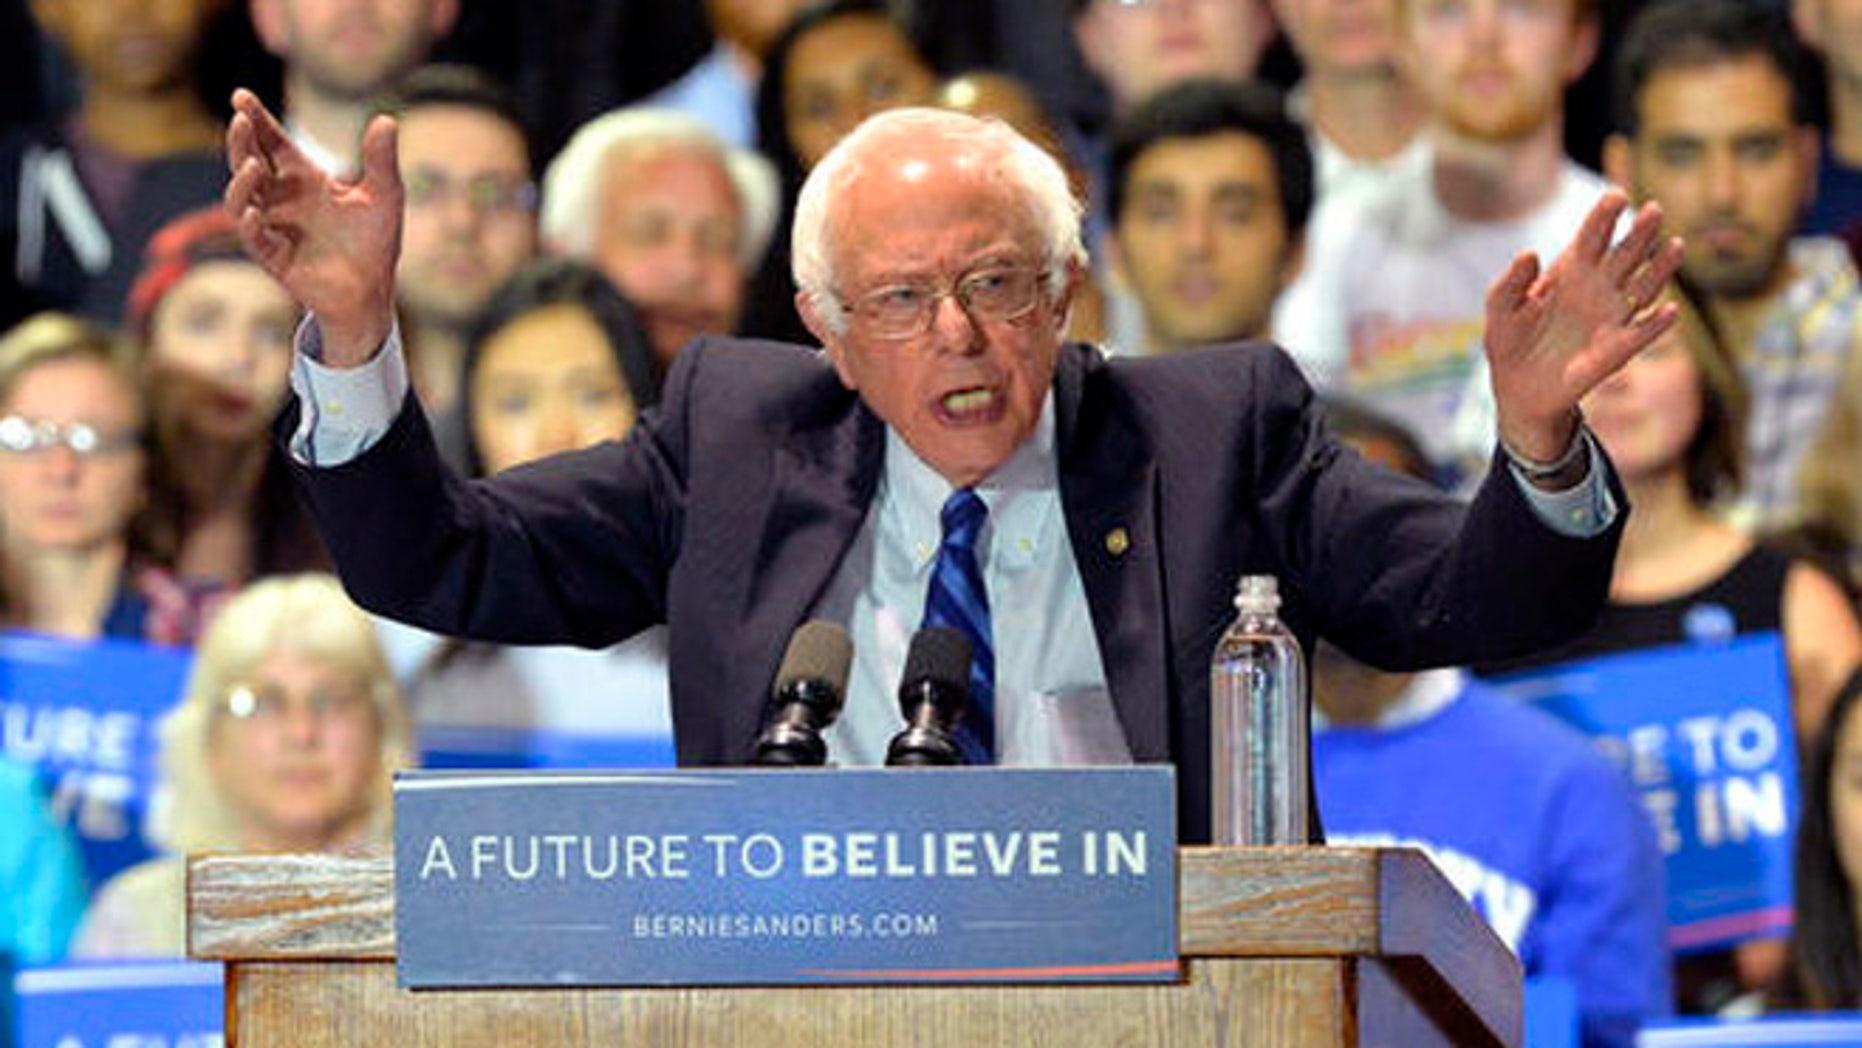 Sen. Bernie Sanders of Vermont, Democratic presidential candidate in 2016